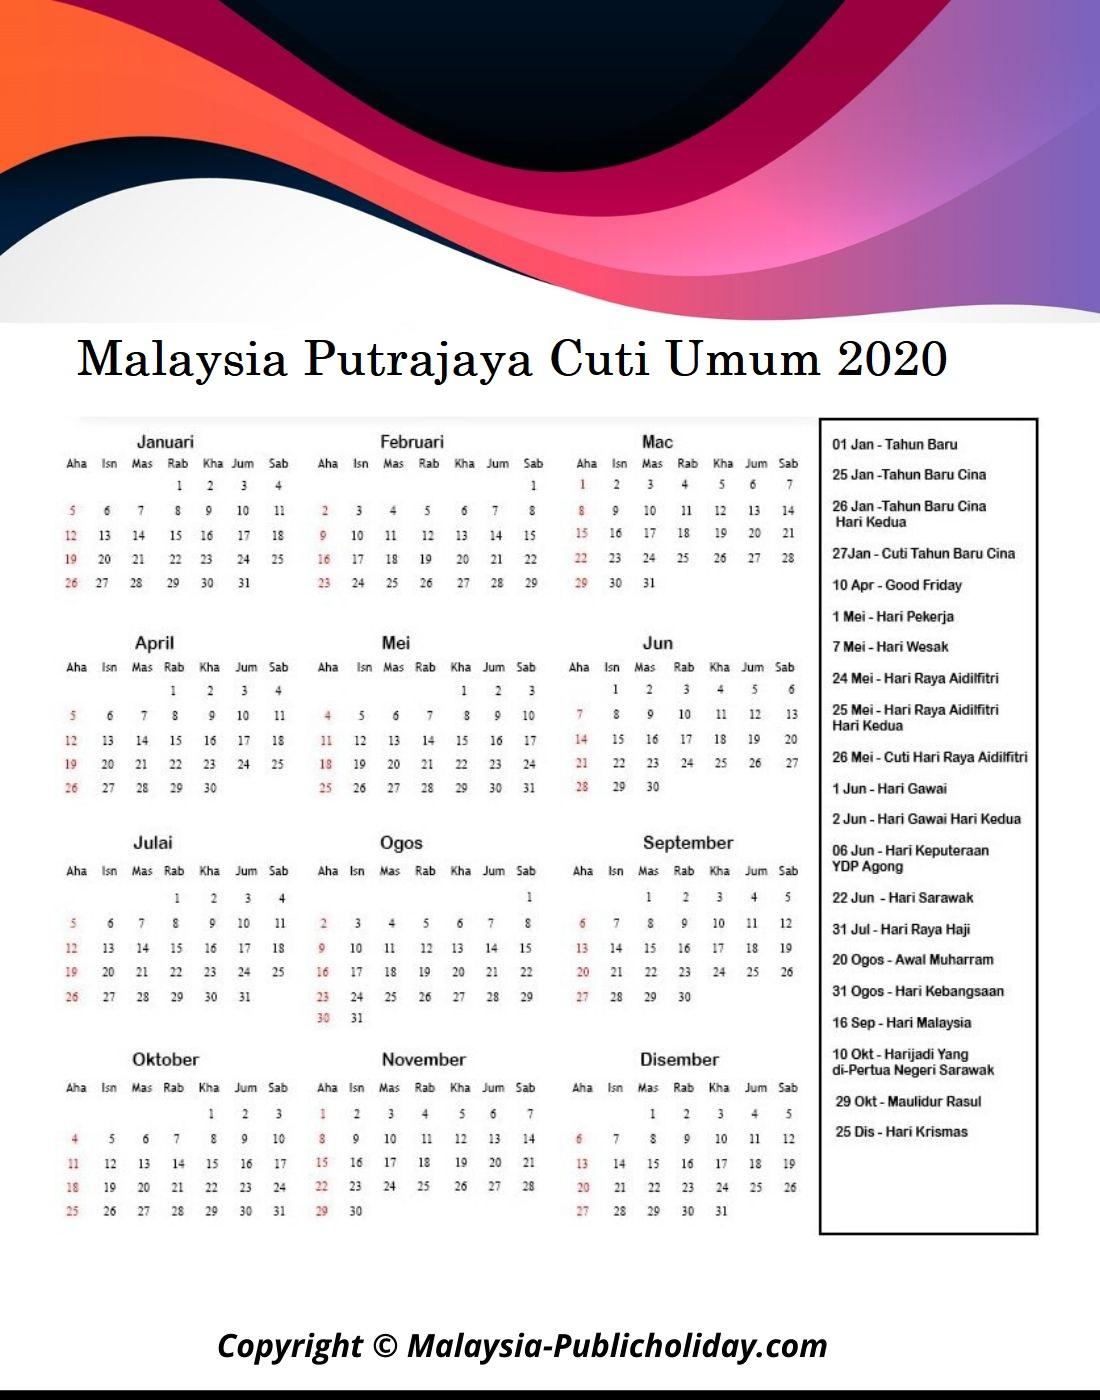 Cuti Umum Putrajaya 2020